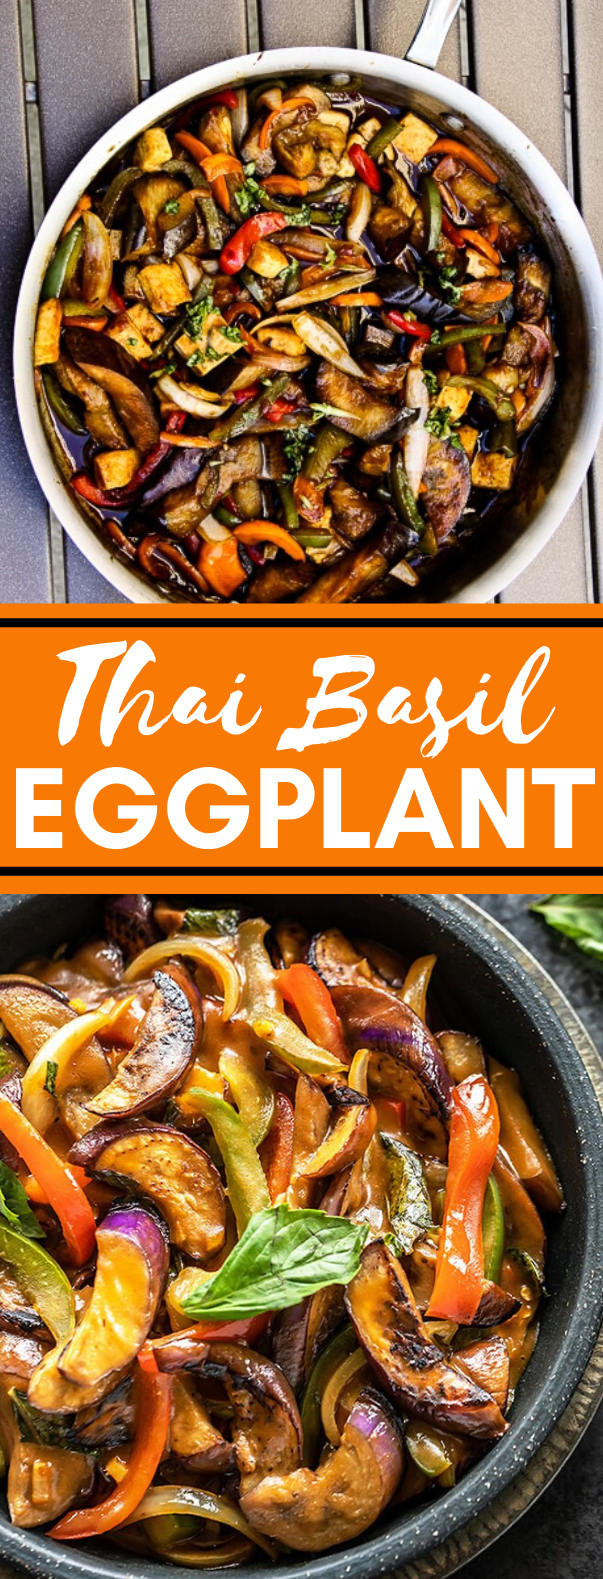 Thai Basil Eggplant Vegan Gluten Free Vegetarian Lunch Vegan Veggies Thaibasil In 2020 Eggplant Recipes Thai Basil Recipes Vegan Eggplant Recipes